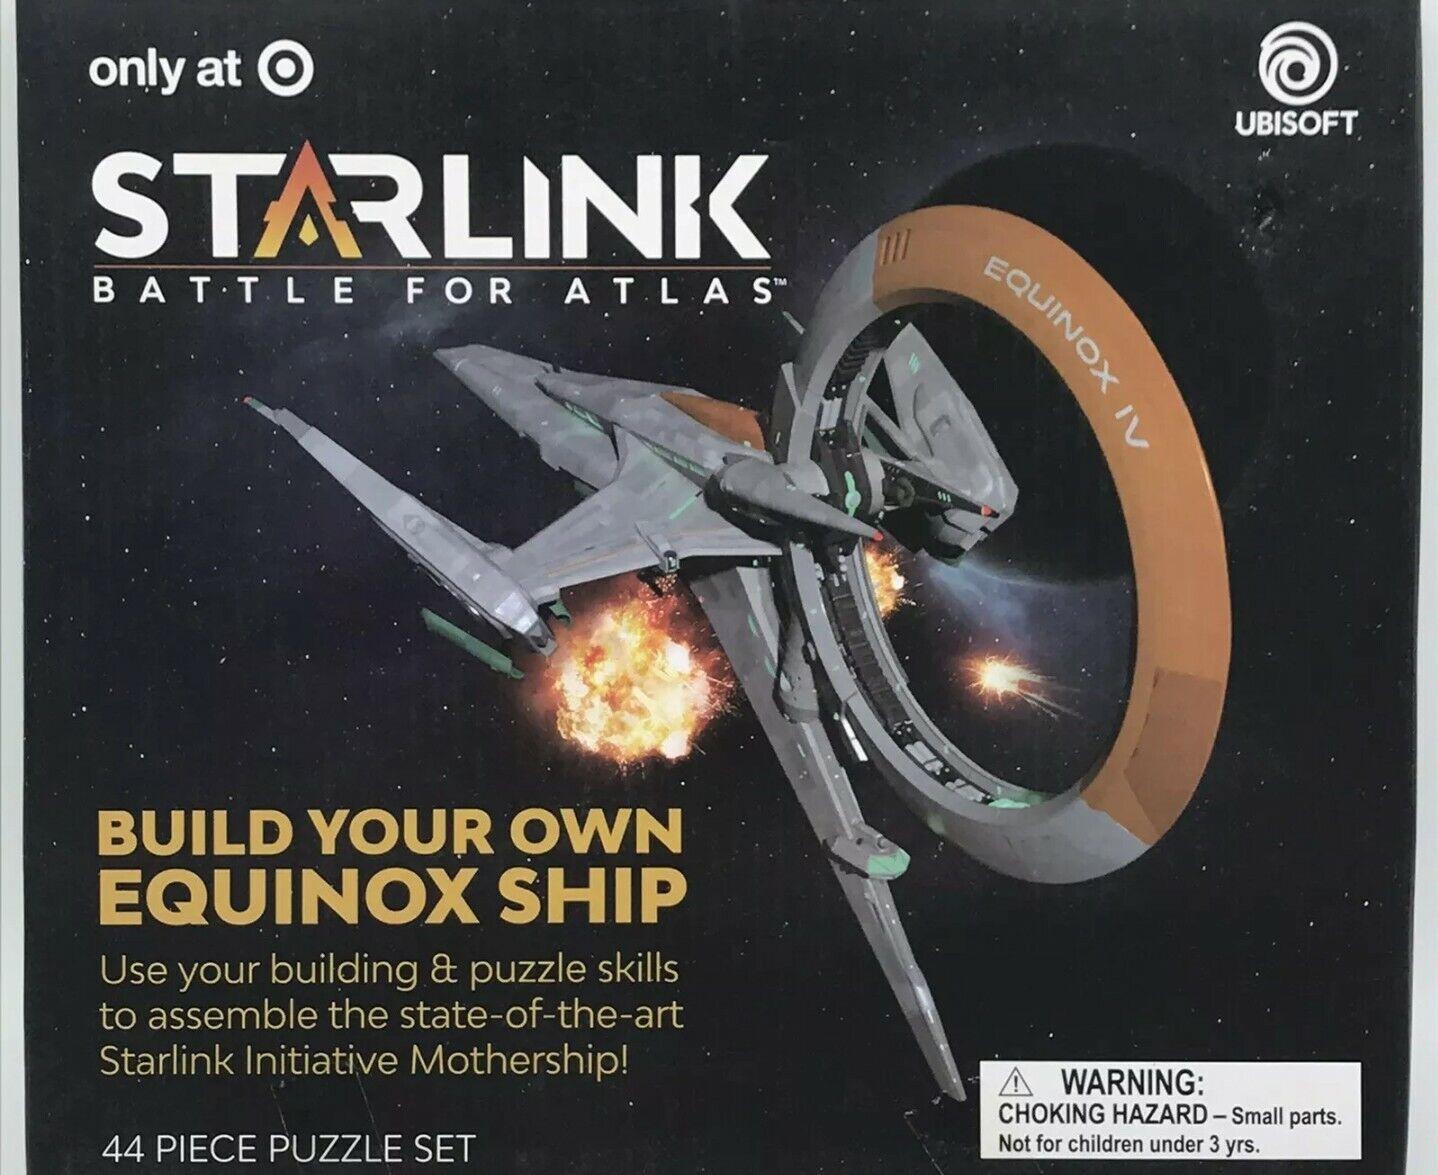 44pc Puzzle Set Starlink Battle for Atlas STEM Build Your Own Equinox Ship